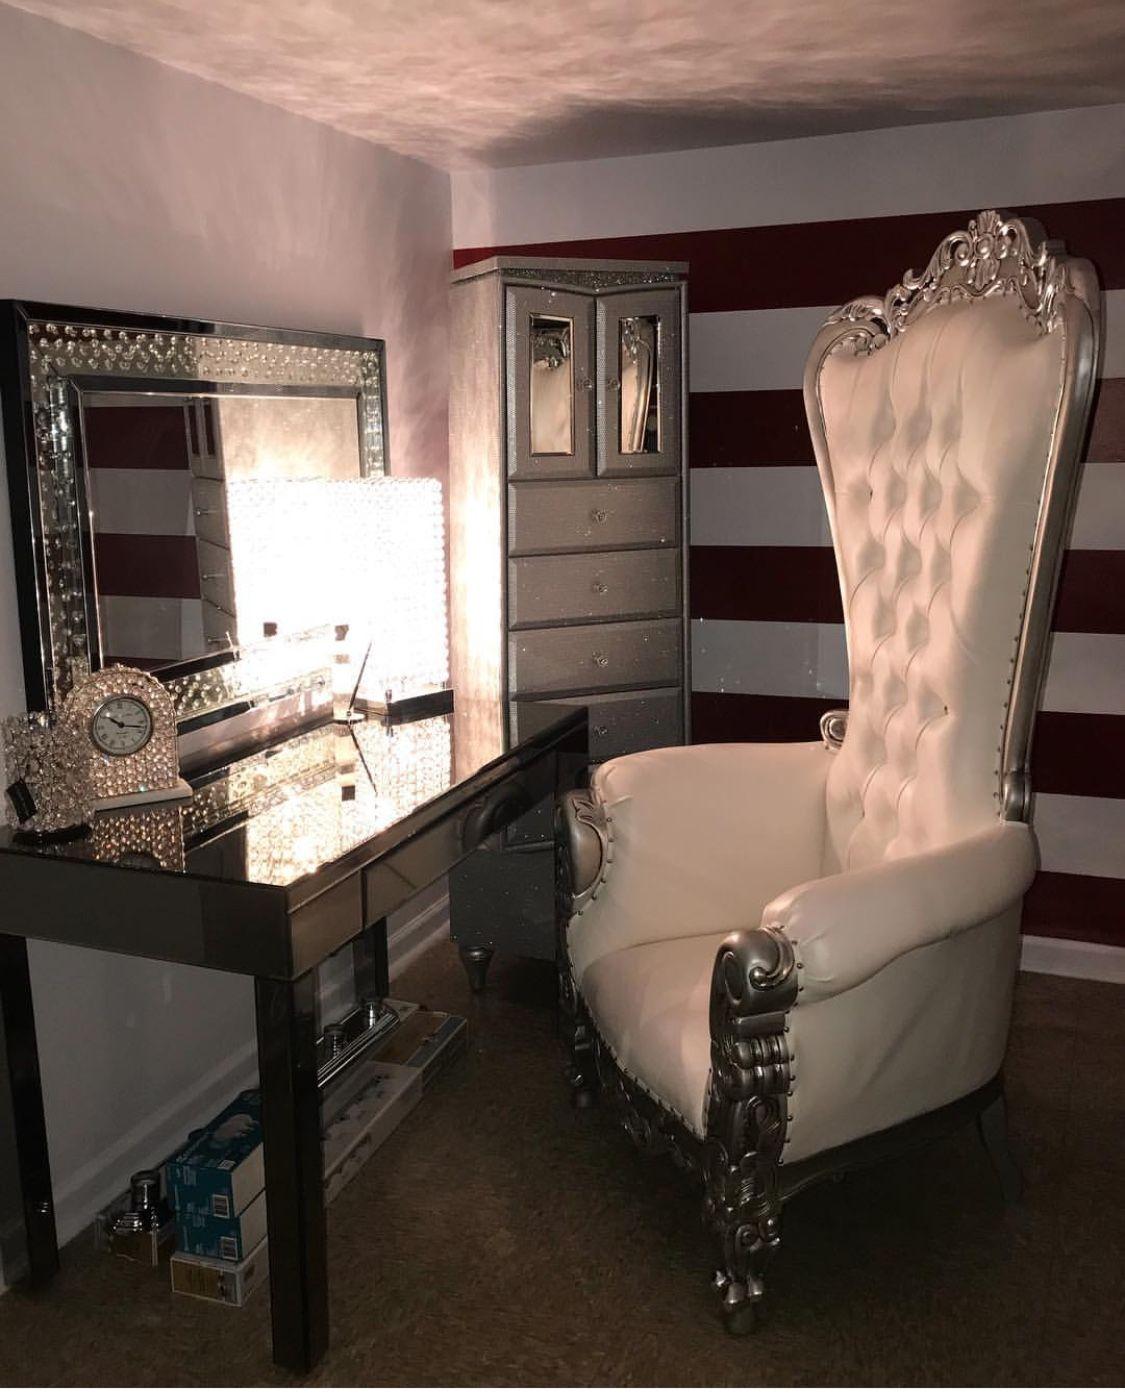 Bedroom Furniture Vanity Bedroom Colour Images Bedroom Decor Pink And Black Bedroom Color Ideas Neutral: Room Decor, Bedroom